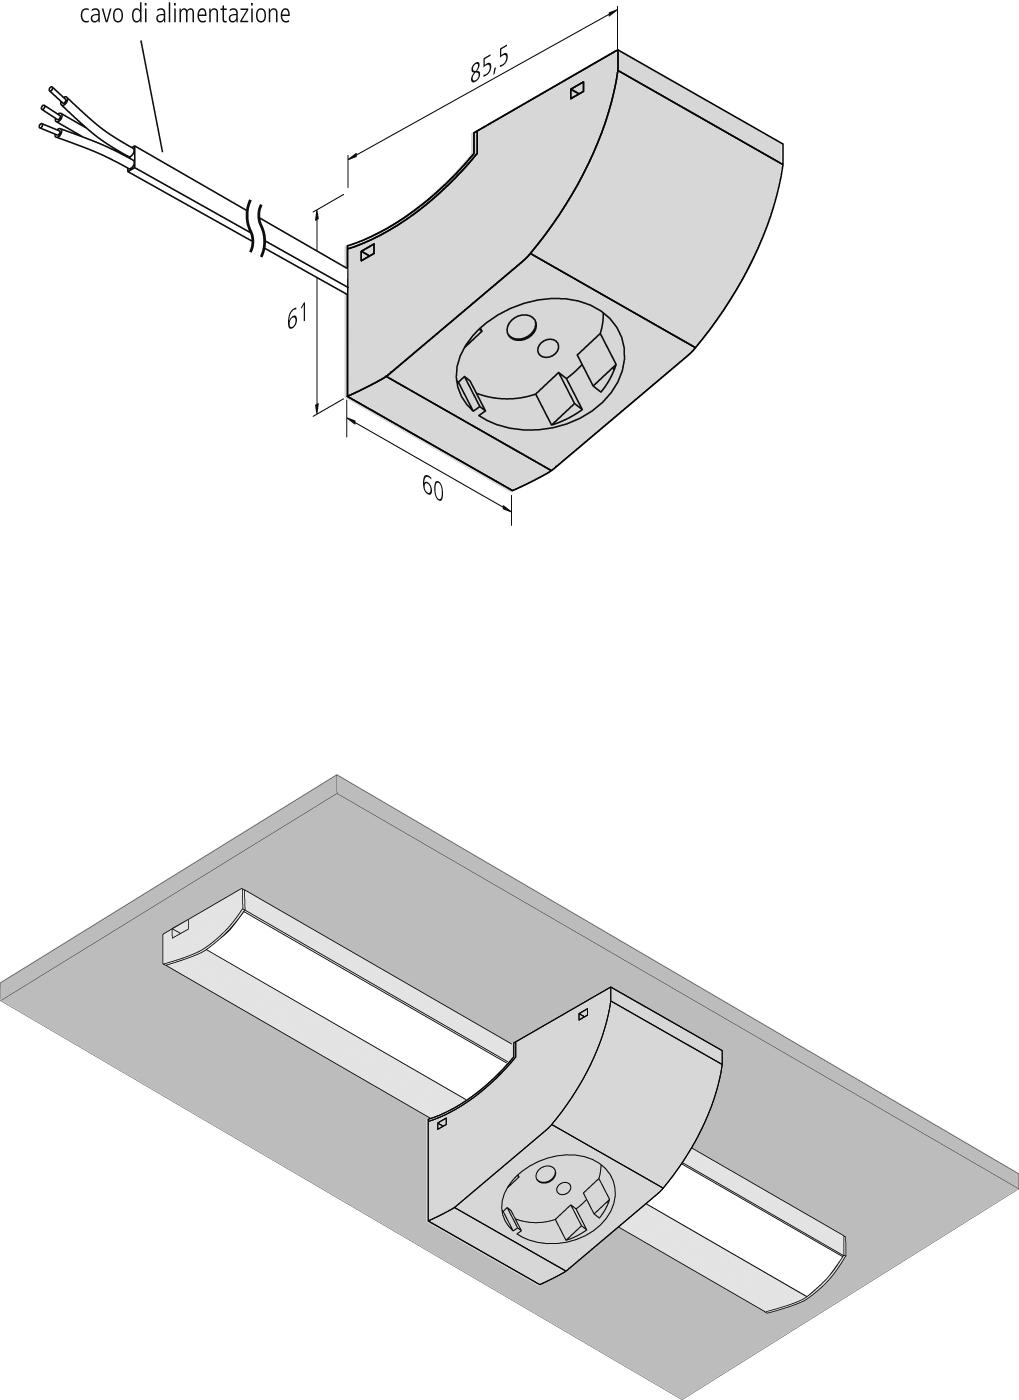 Anteprima: Steckdose-LED-ModuLite-F_it